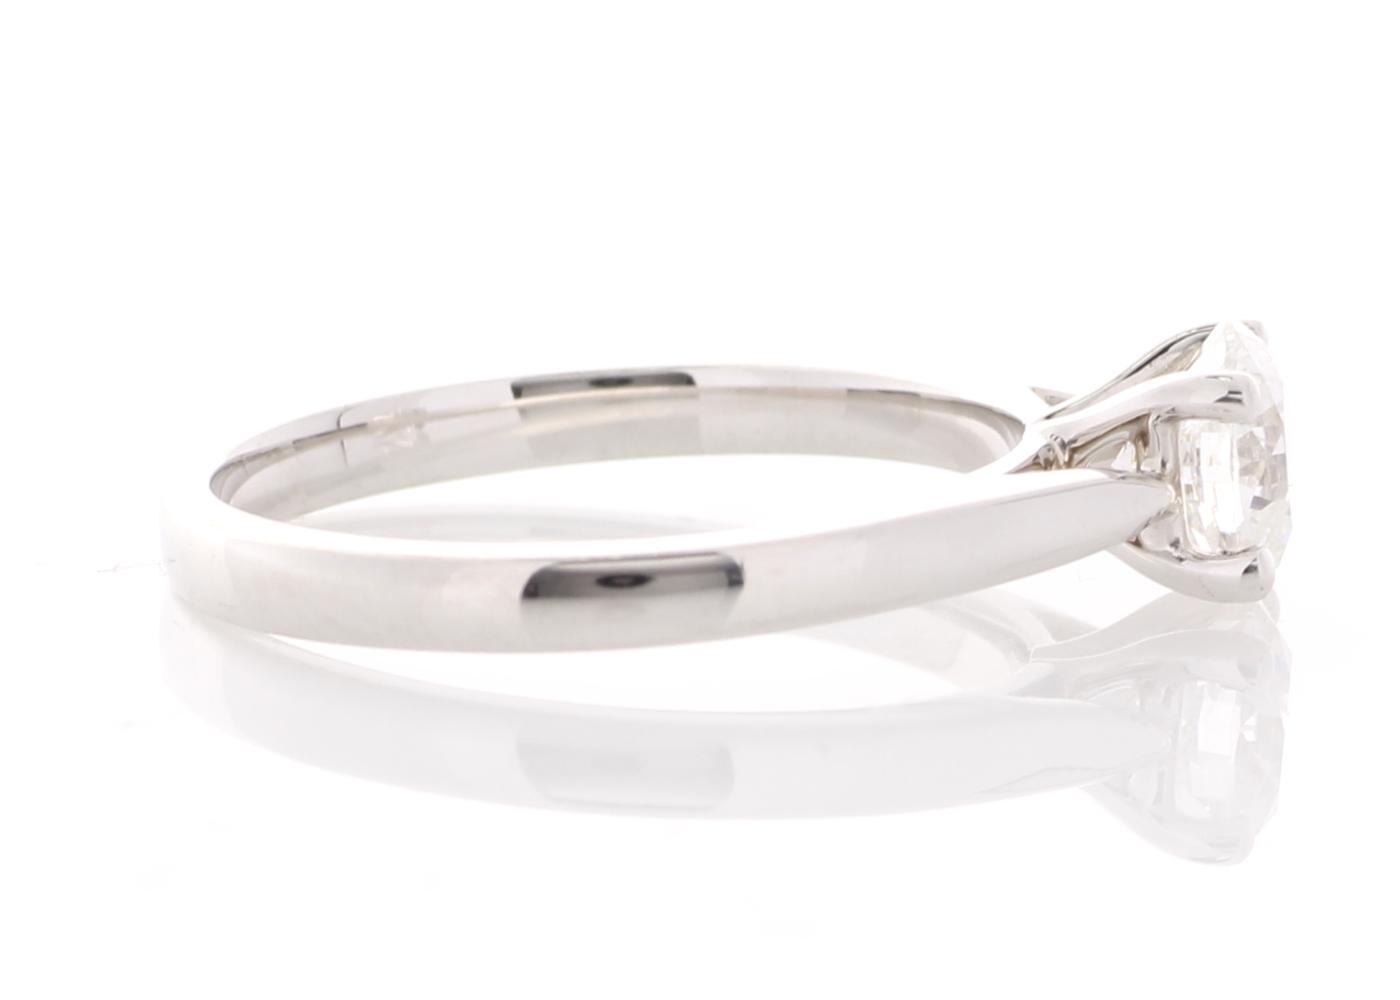 Lot 13 - 18ct White Gold Single Stone Prong Set Diamond Ring 0.73 Carats